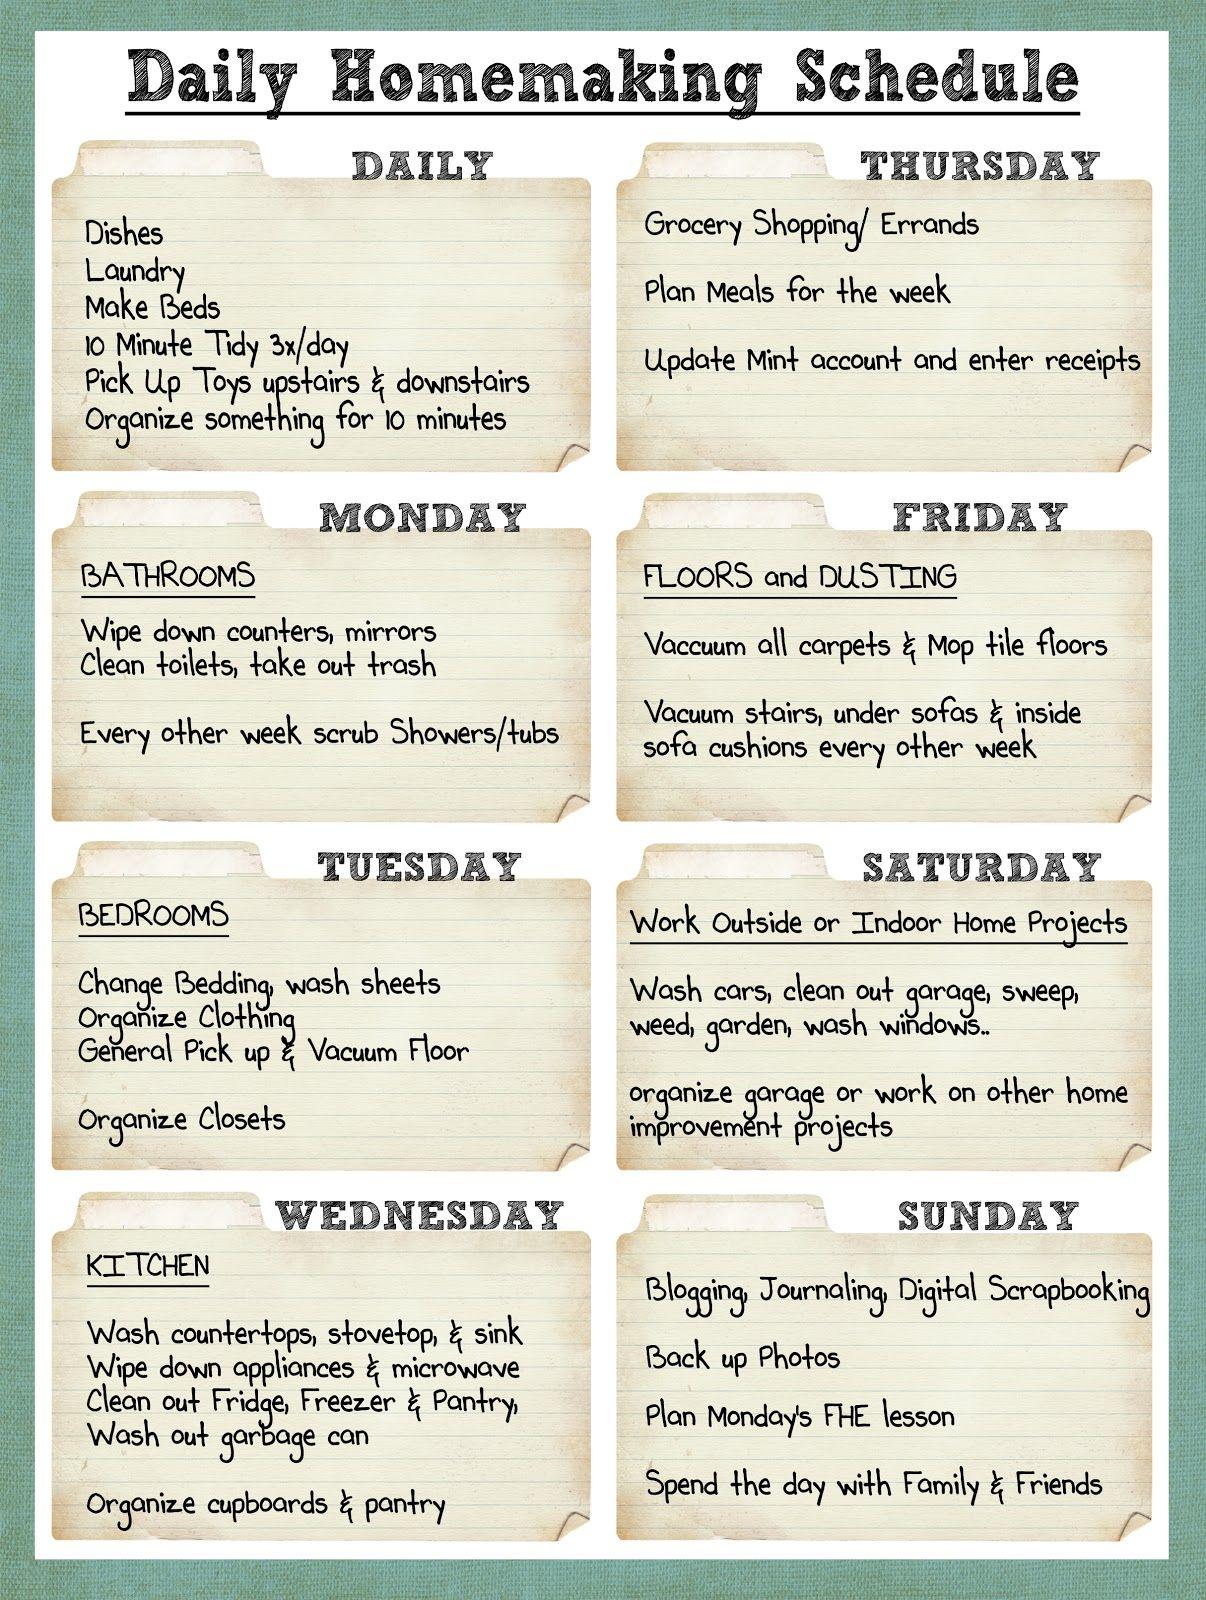 Daily+Homemaking+Schedule.jpg 1,206×1,600 pixels